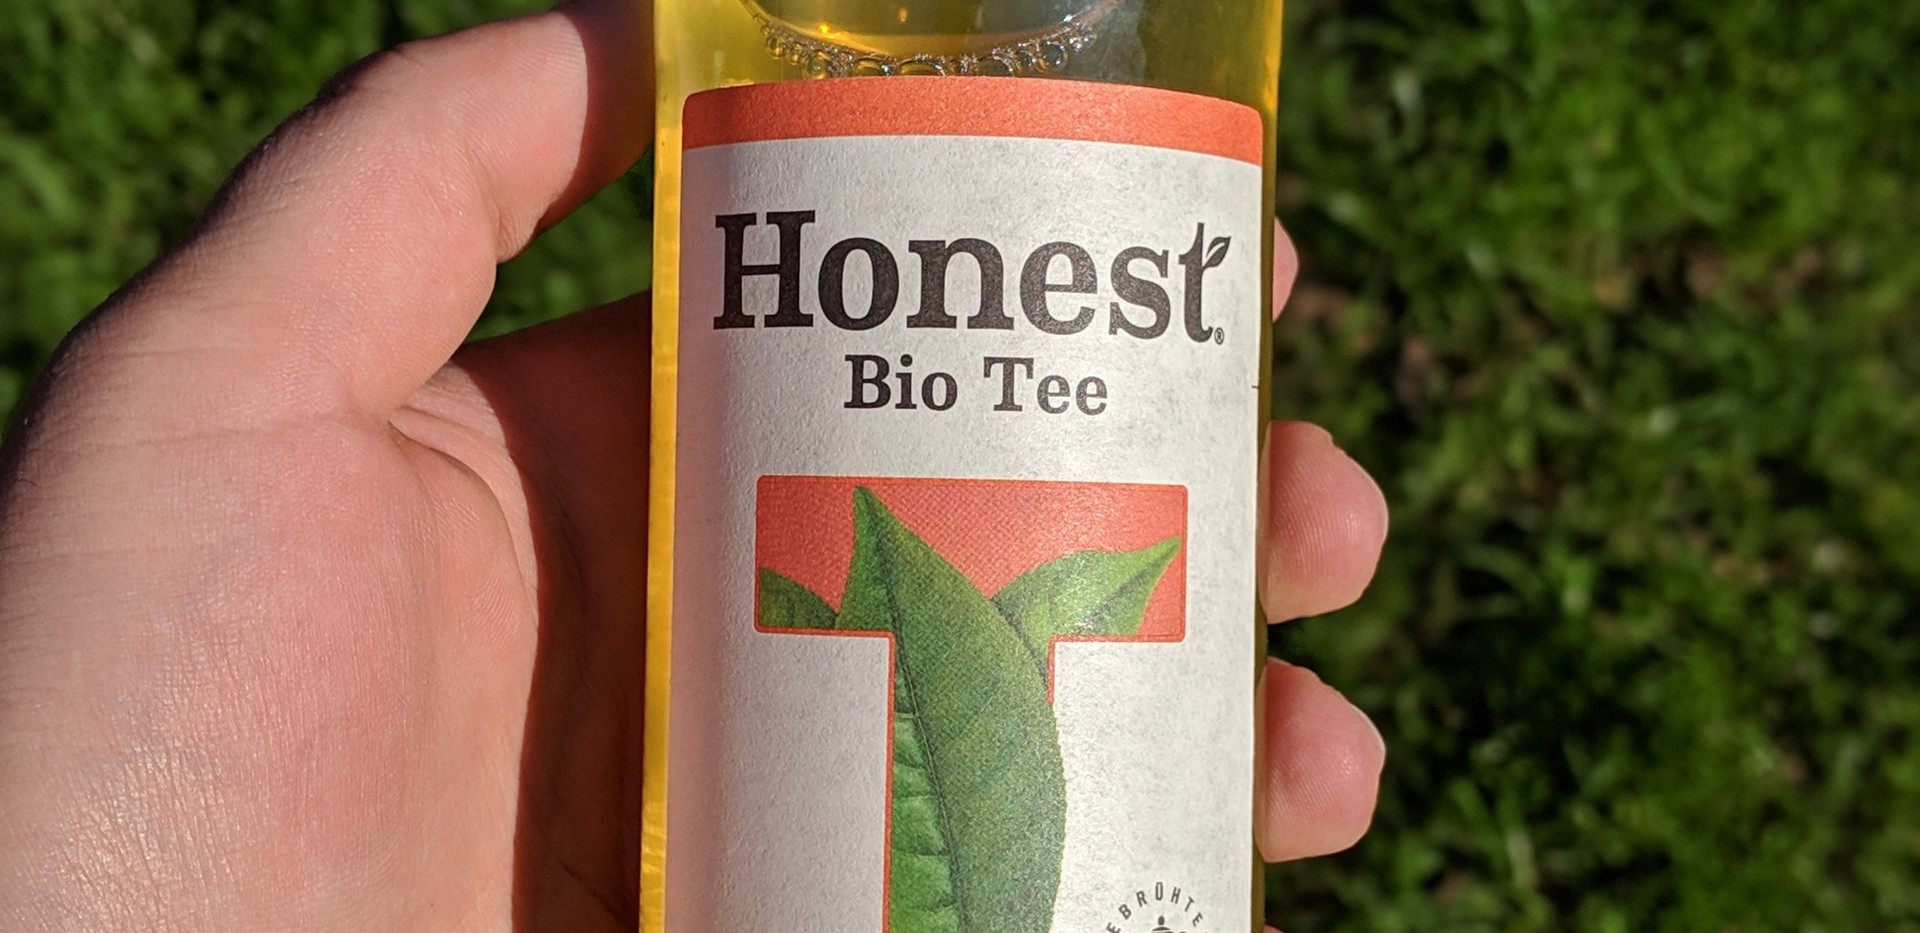 Honest Bio Tee